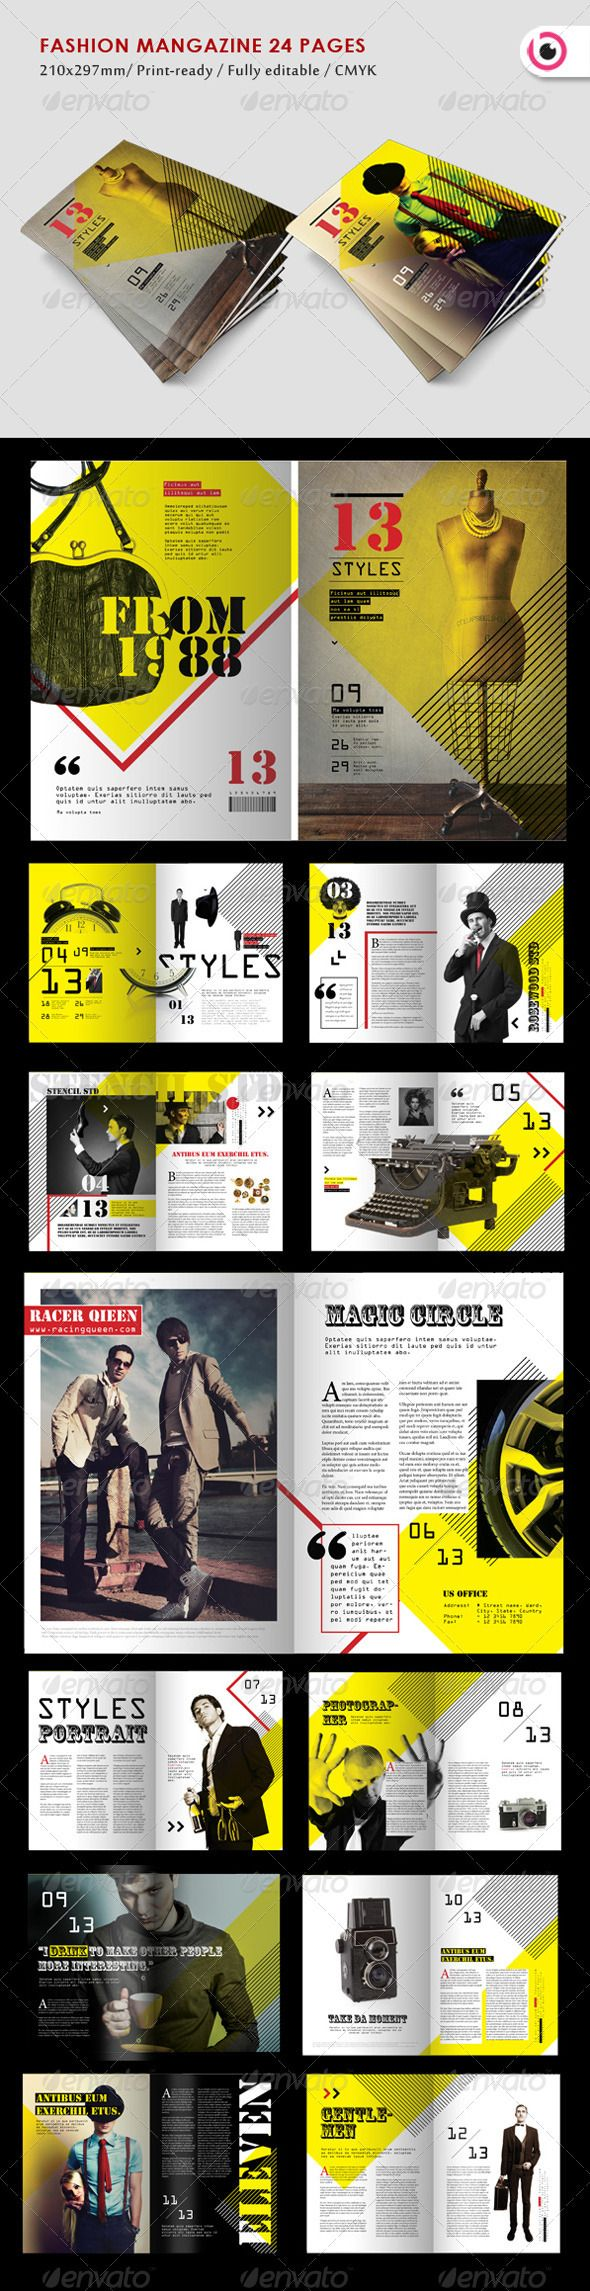 Fashion Style Magazine - GraphicRiver Item for Sale